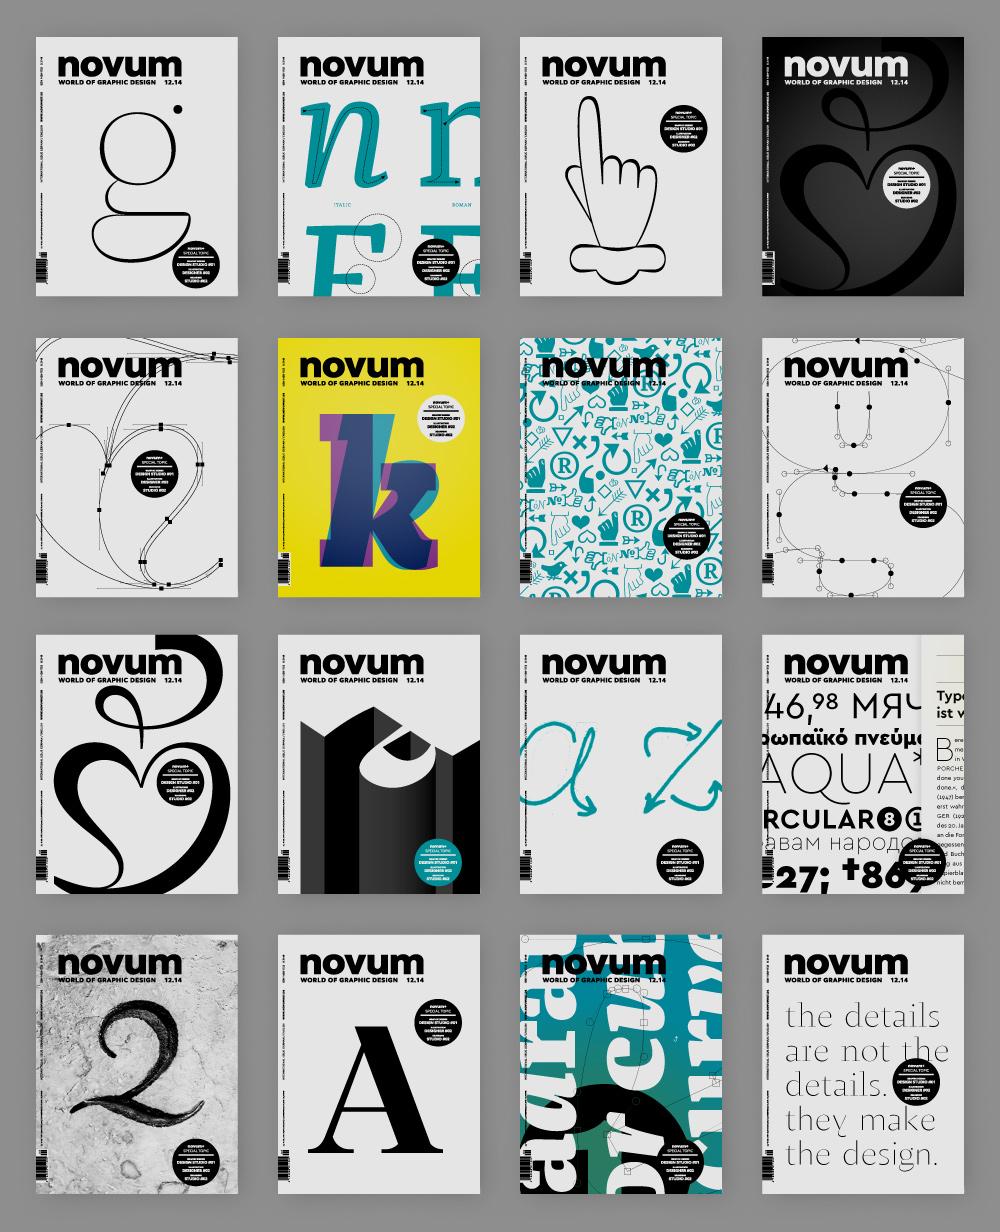 Novum Magazin Dezember 2014, jakob runge, Cover, Titelblat, design, Zitat, Gestaltung, Prägung, Typografie, Varianten, Entwürfe